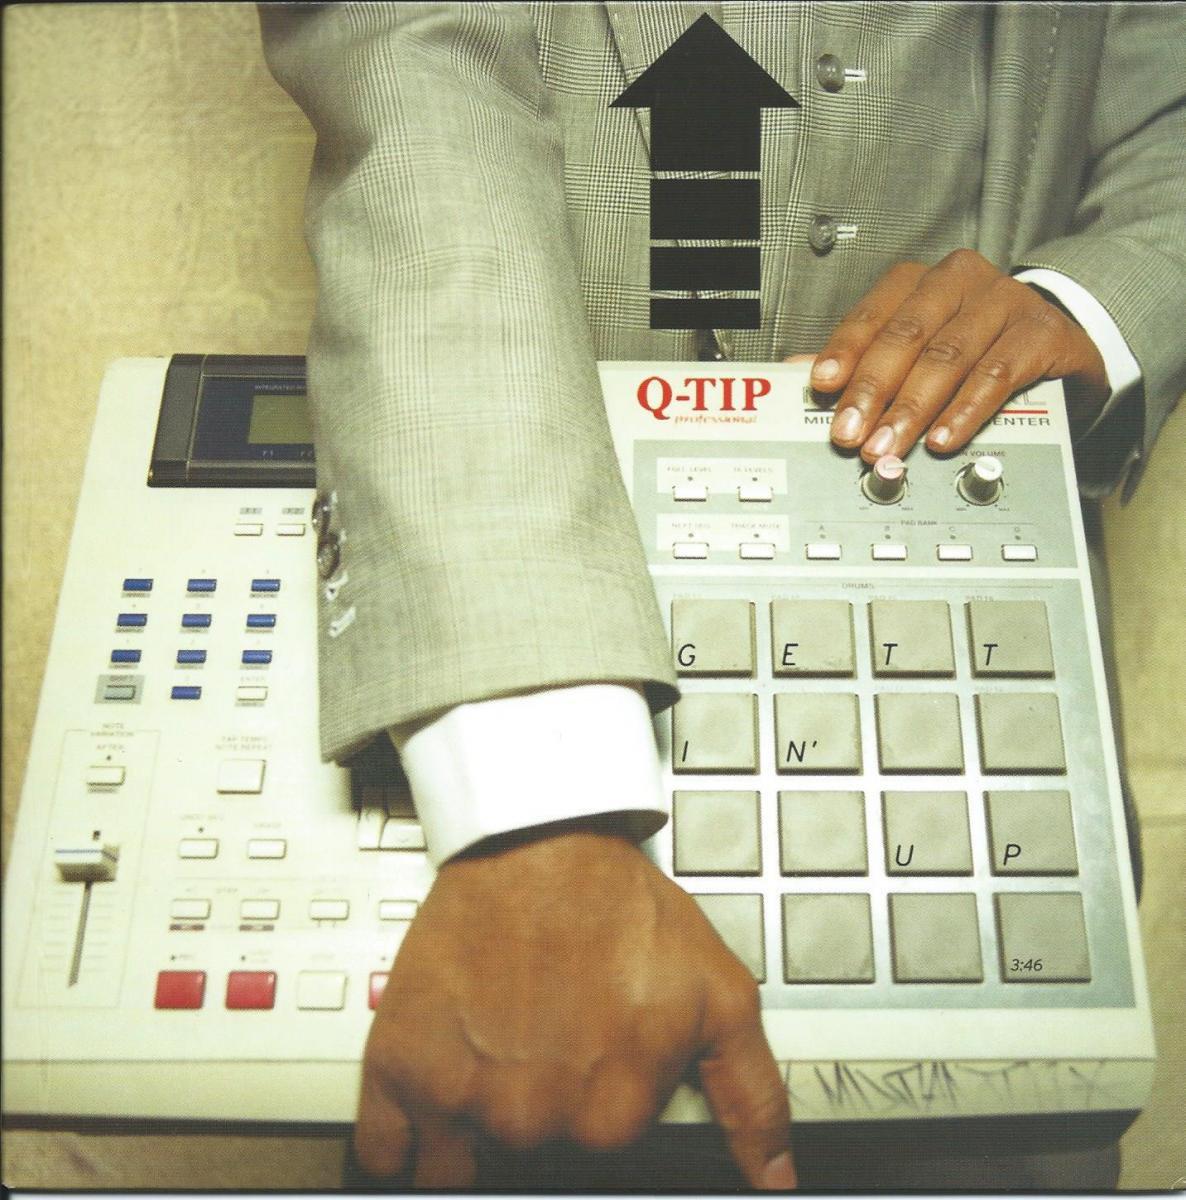 Q-TIP / GETTIN' UP / MOVE (PROD BY J-DILLA) (7